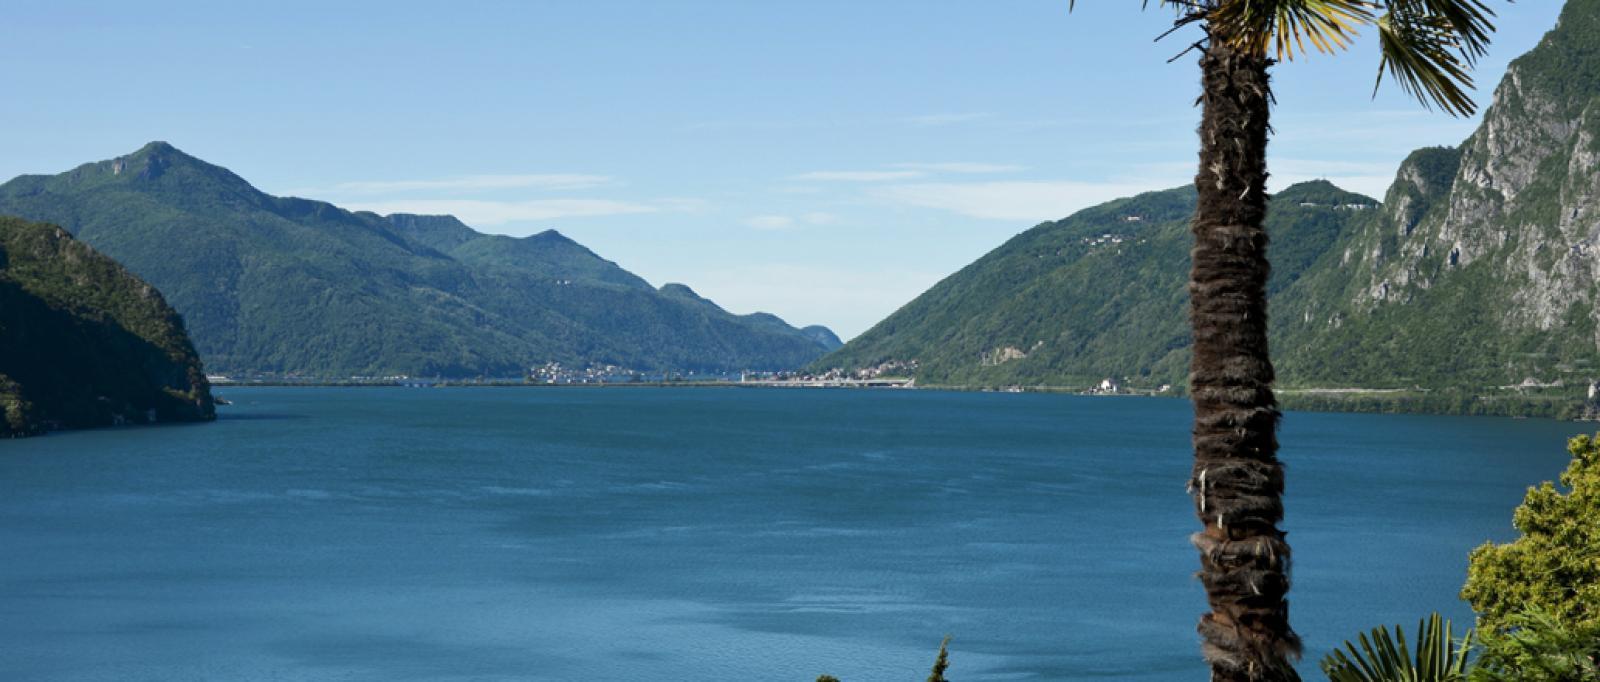 Hotel San Marco Lugano